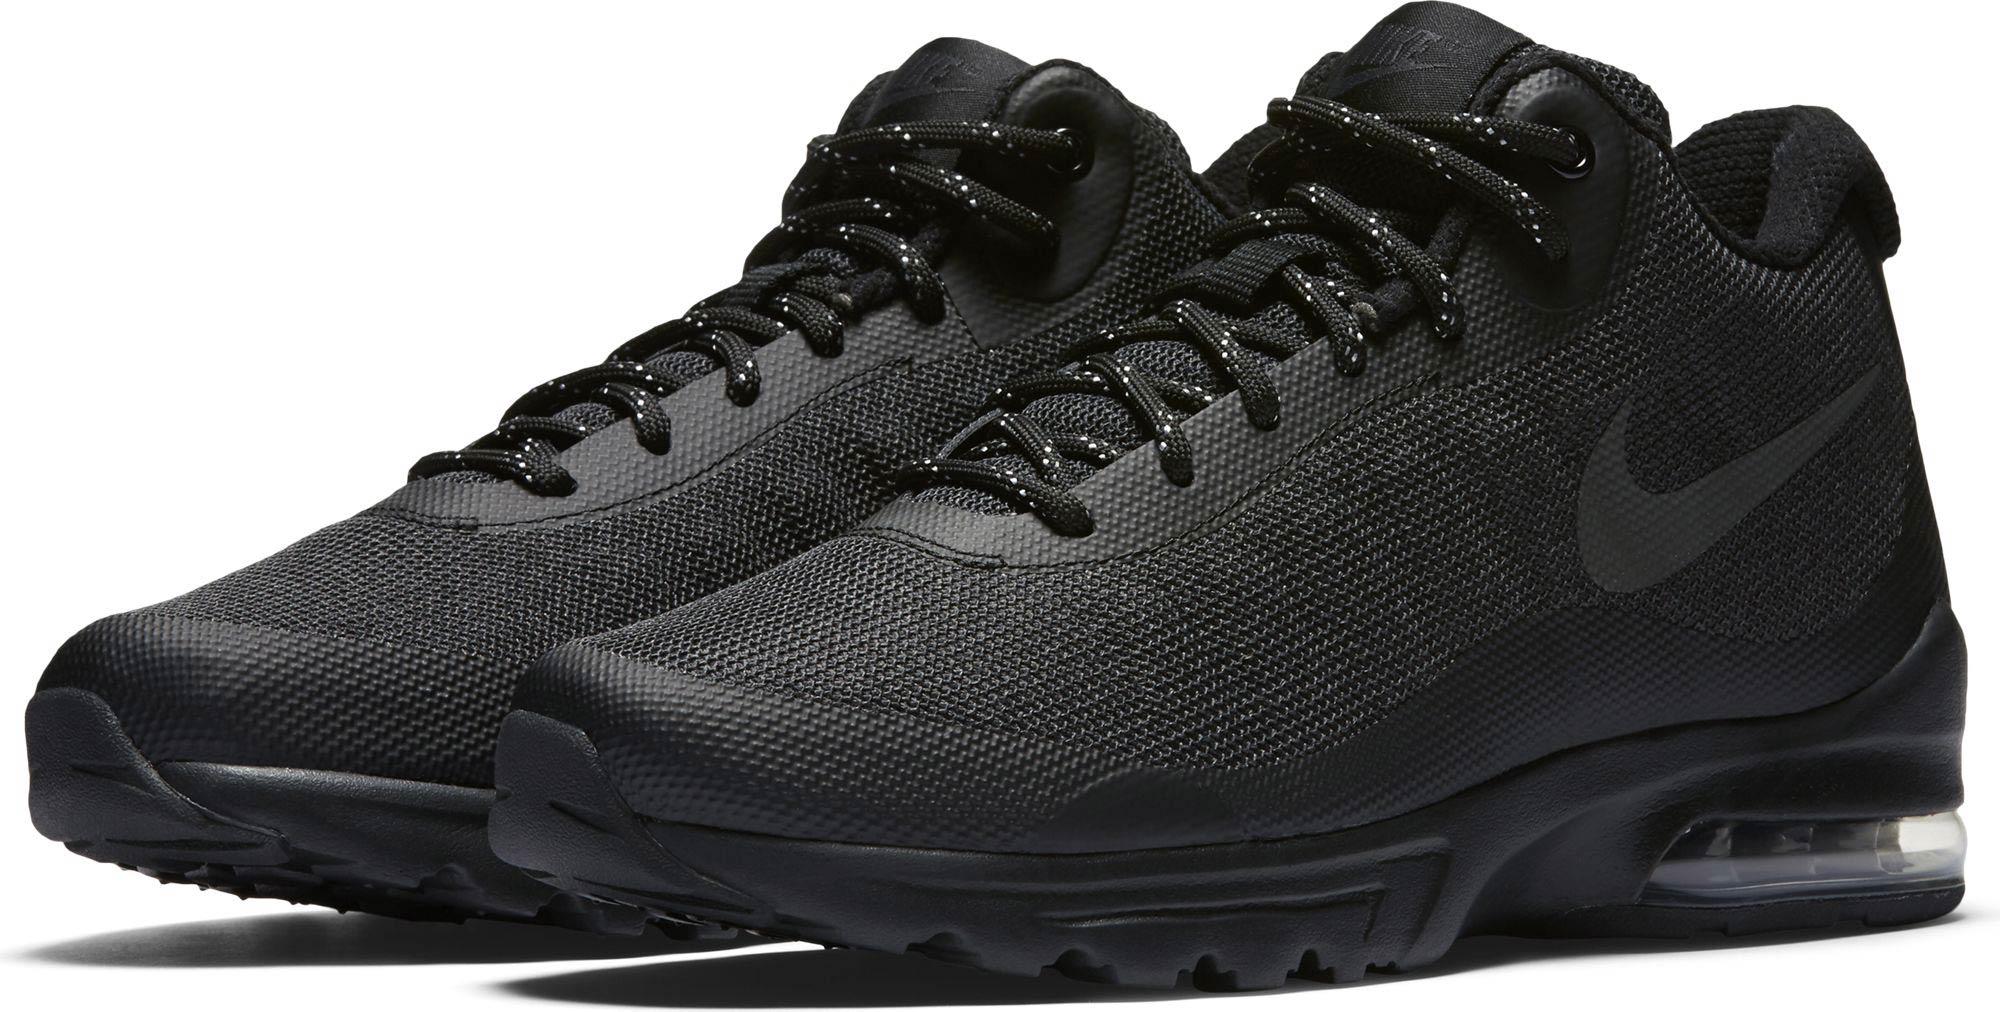 ea8671c3ec ... black anthracite size 9 460c0 01ce6 sweden nike air max invigor mid shoe.  papuci casual brbai. papuci casual brbai. ...